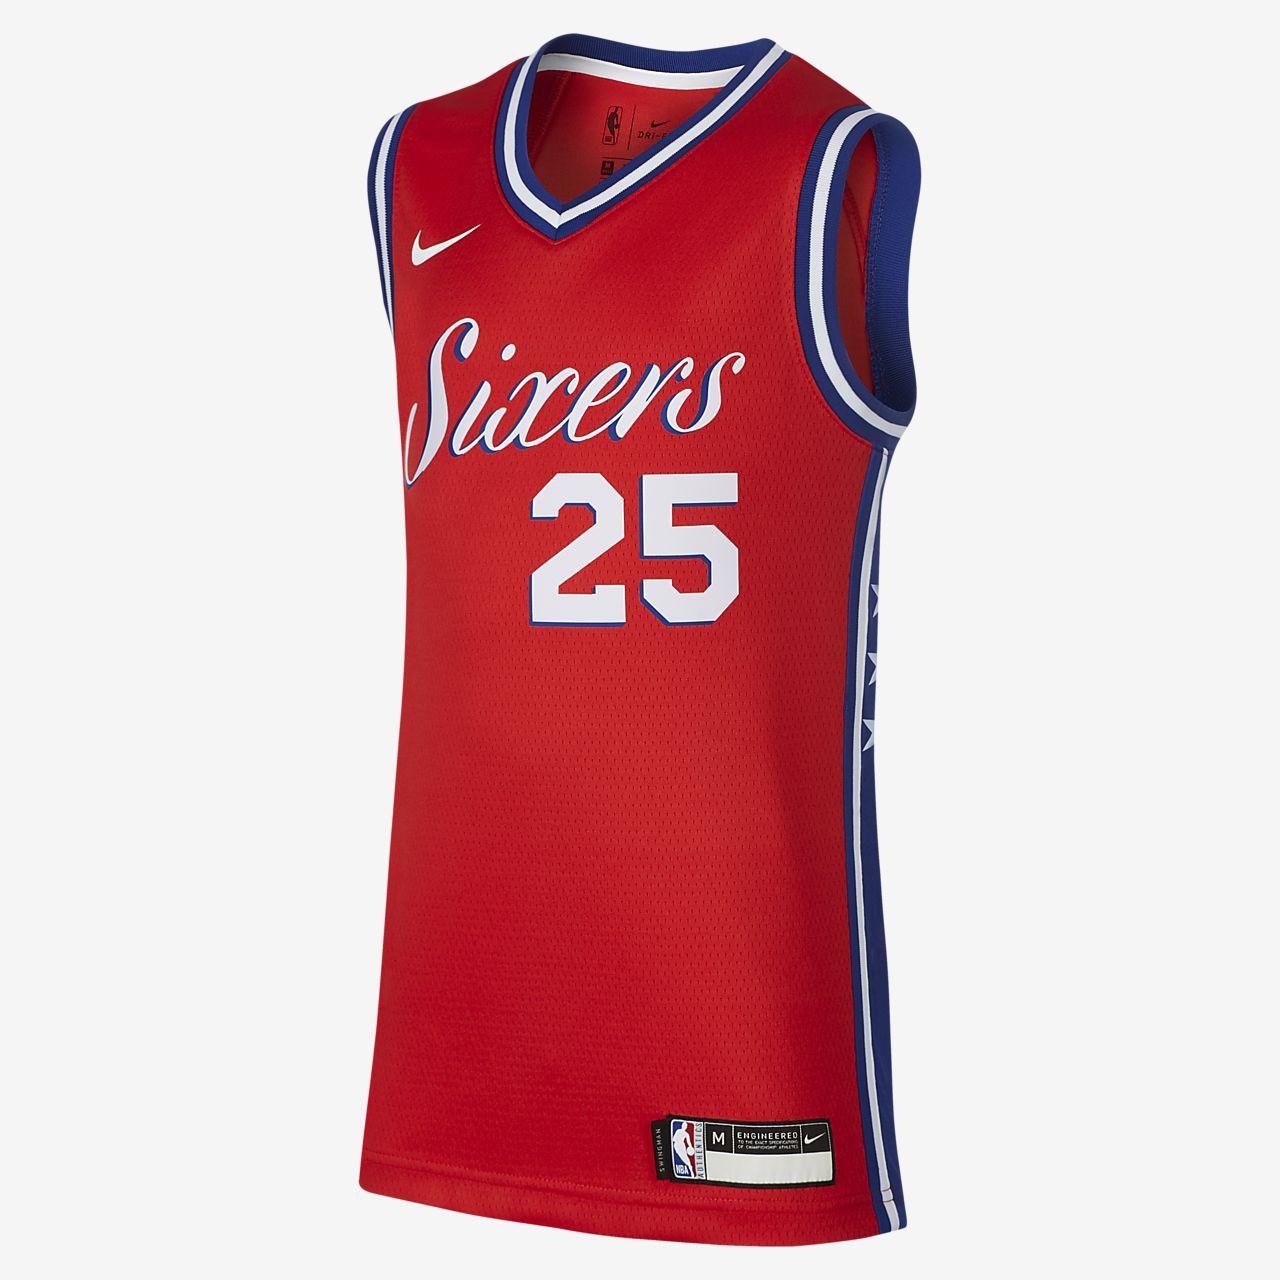 费城 76 人队 Statement Edition SwingmanNike NBA Jersey大童(男孩)球衣